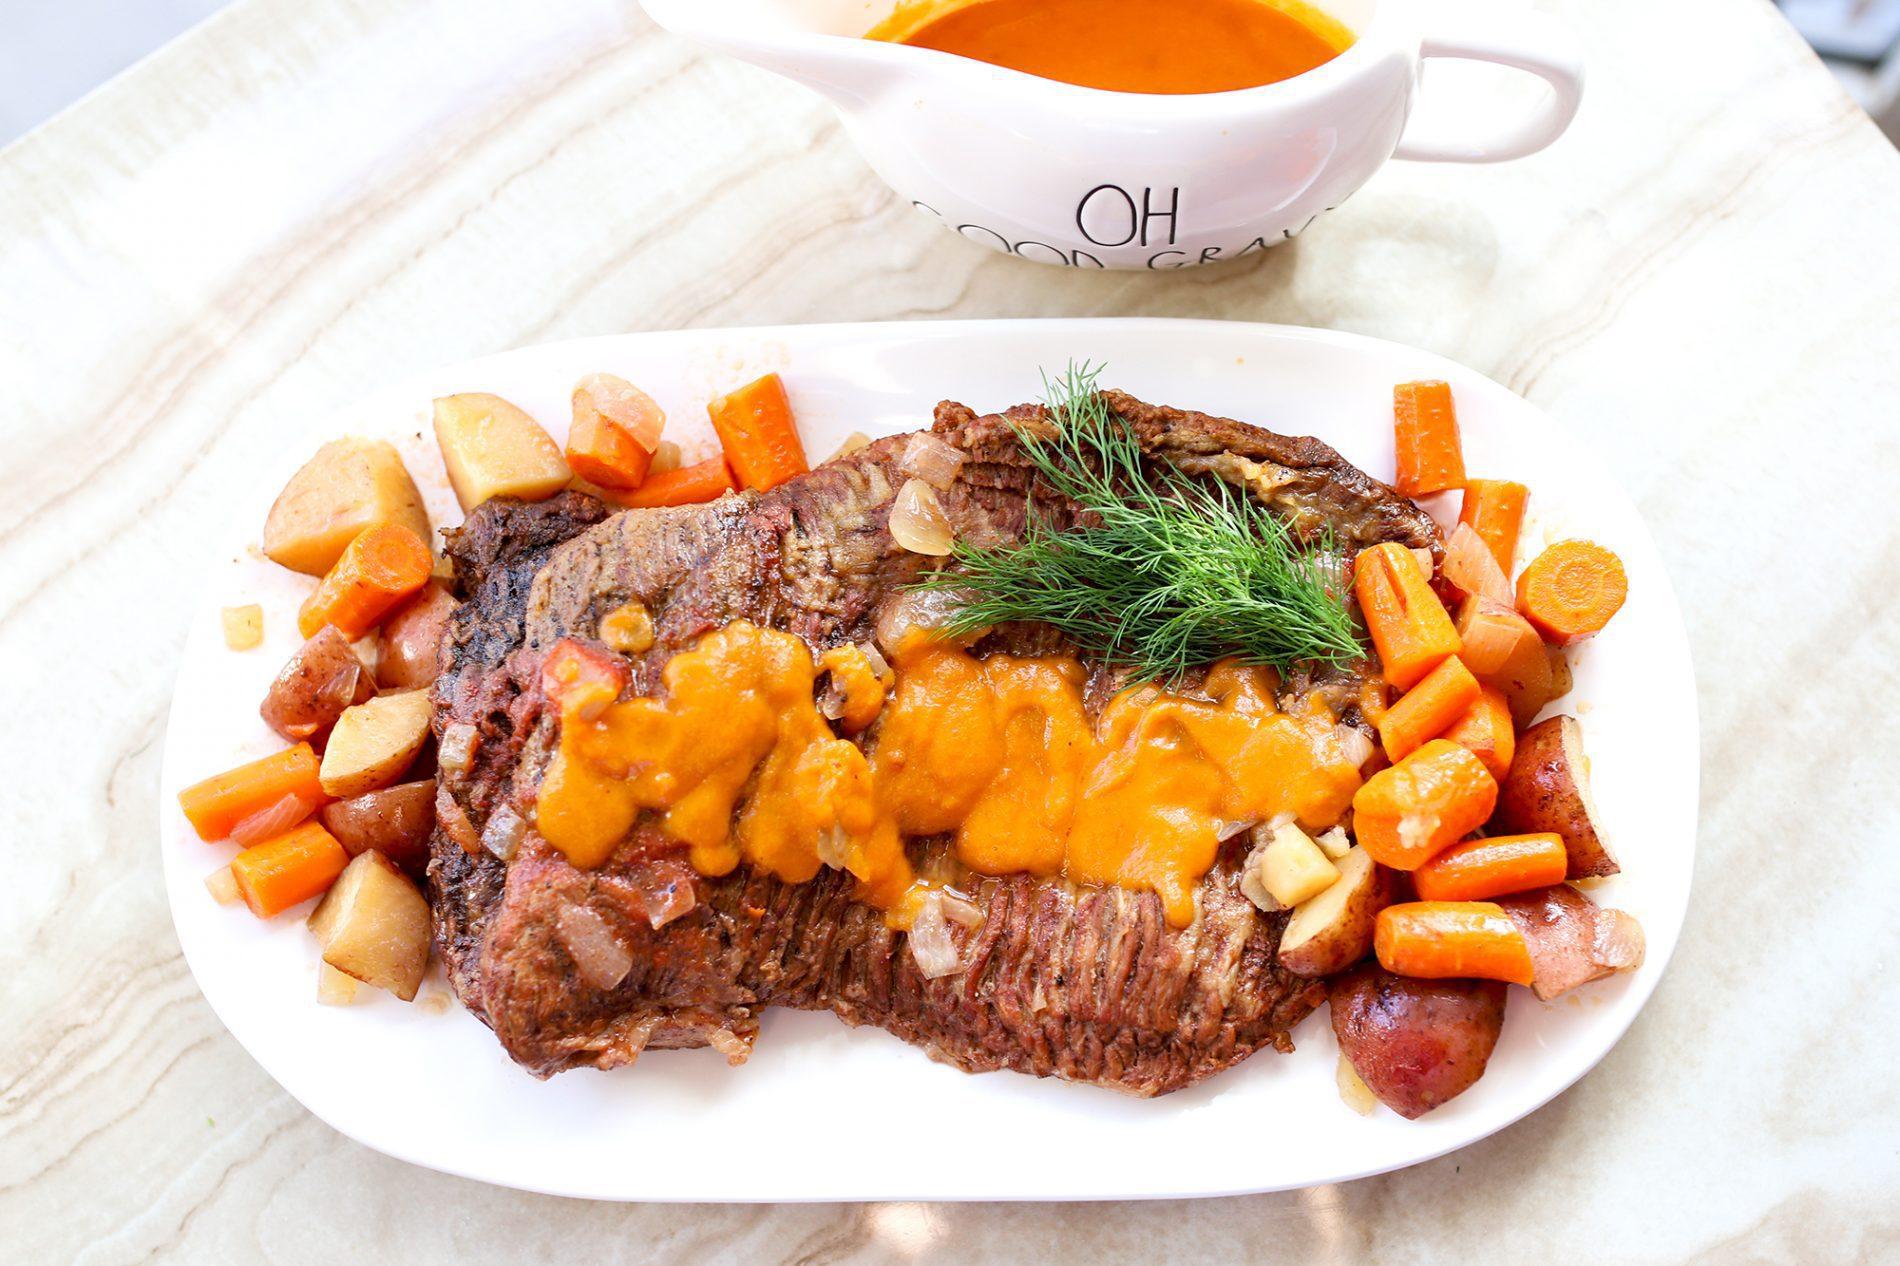 pot roast potatoes and carrots with homemade gravy